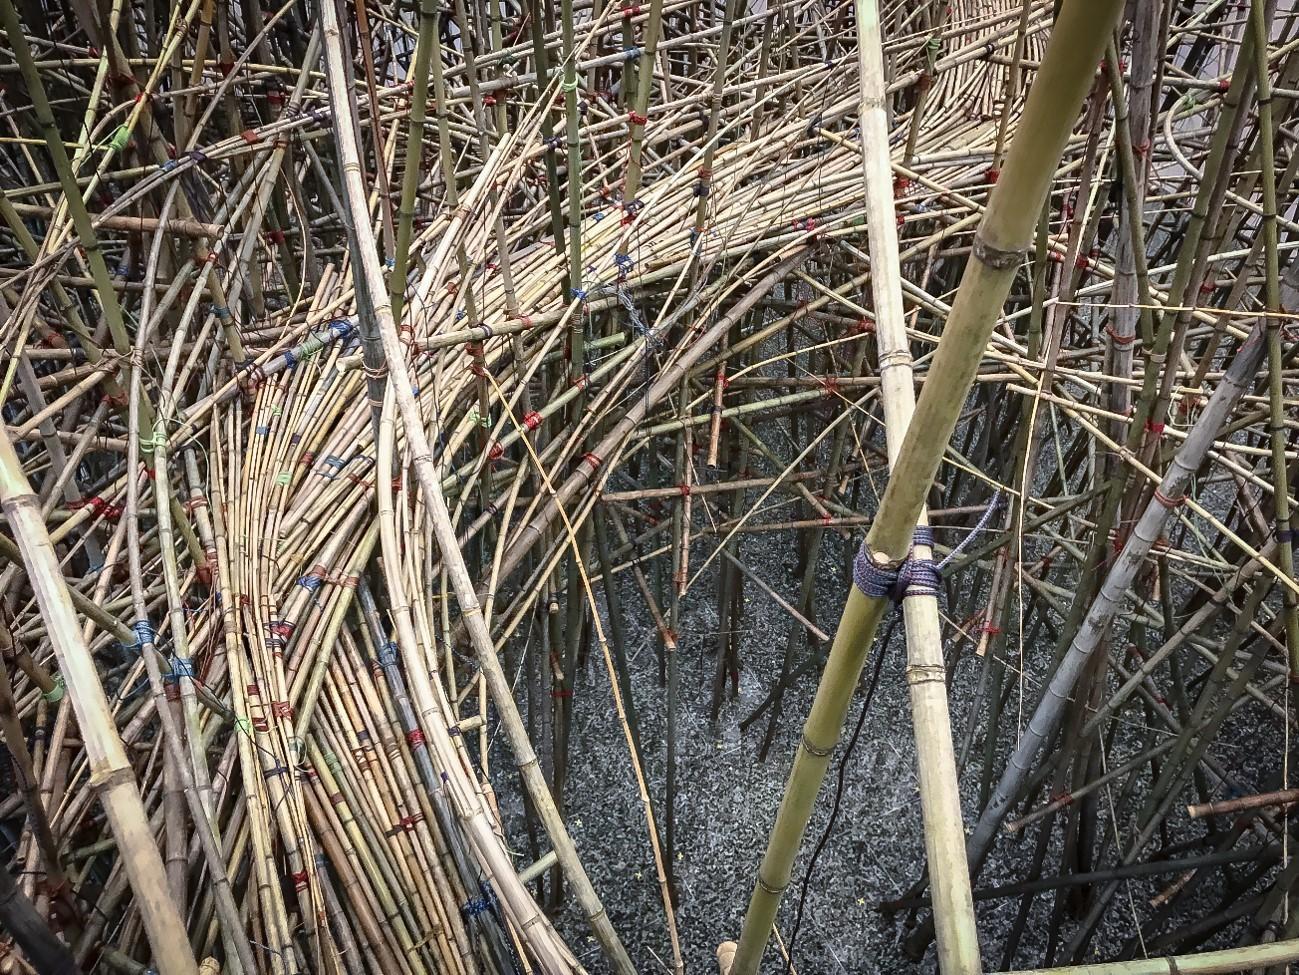 Big Bambu in progress photo by Starn brothers